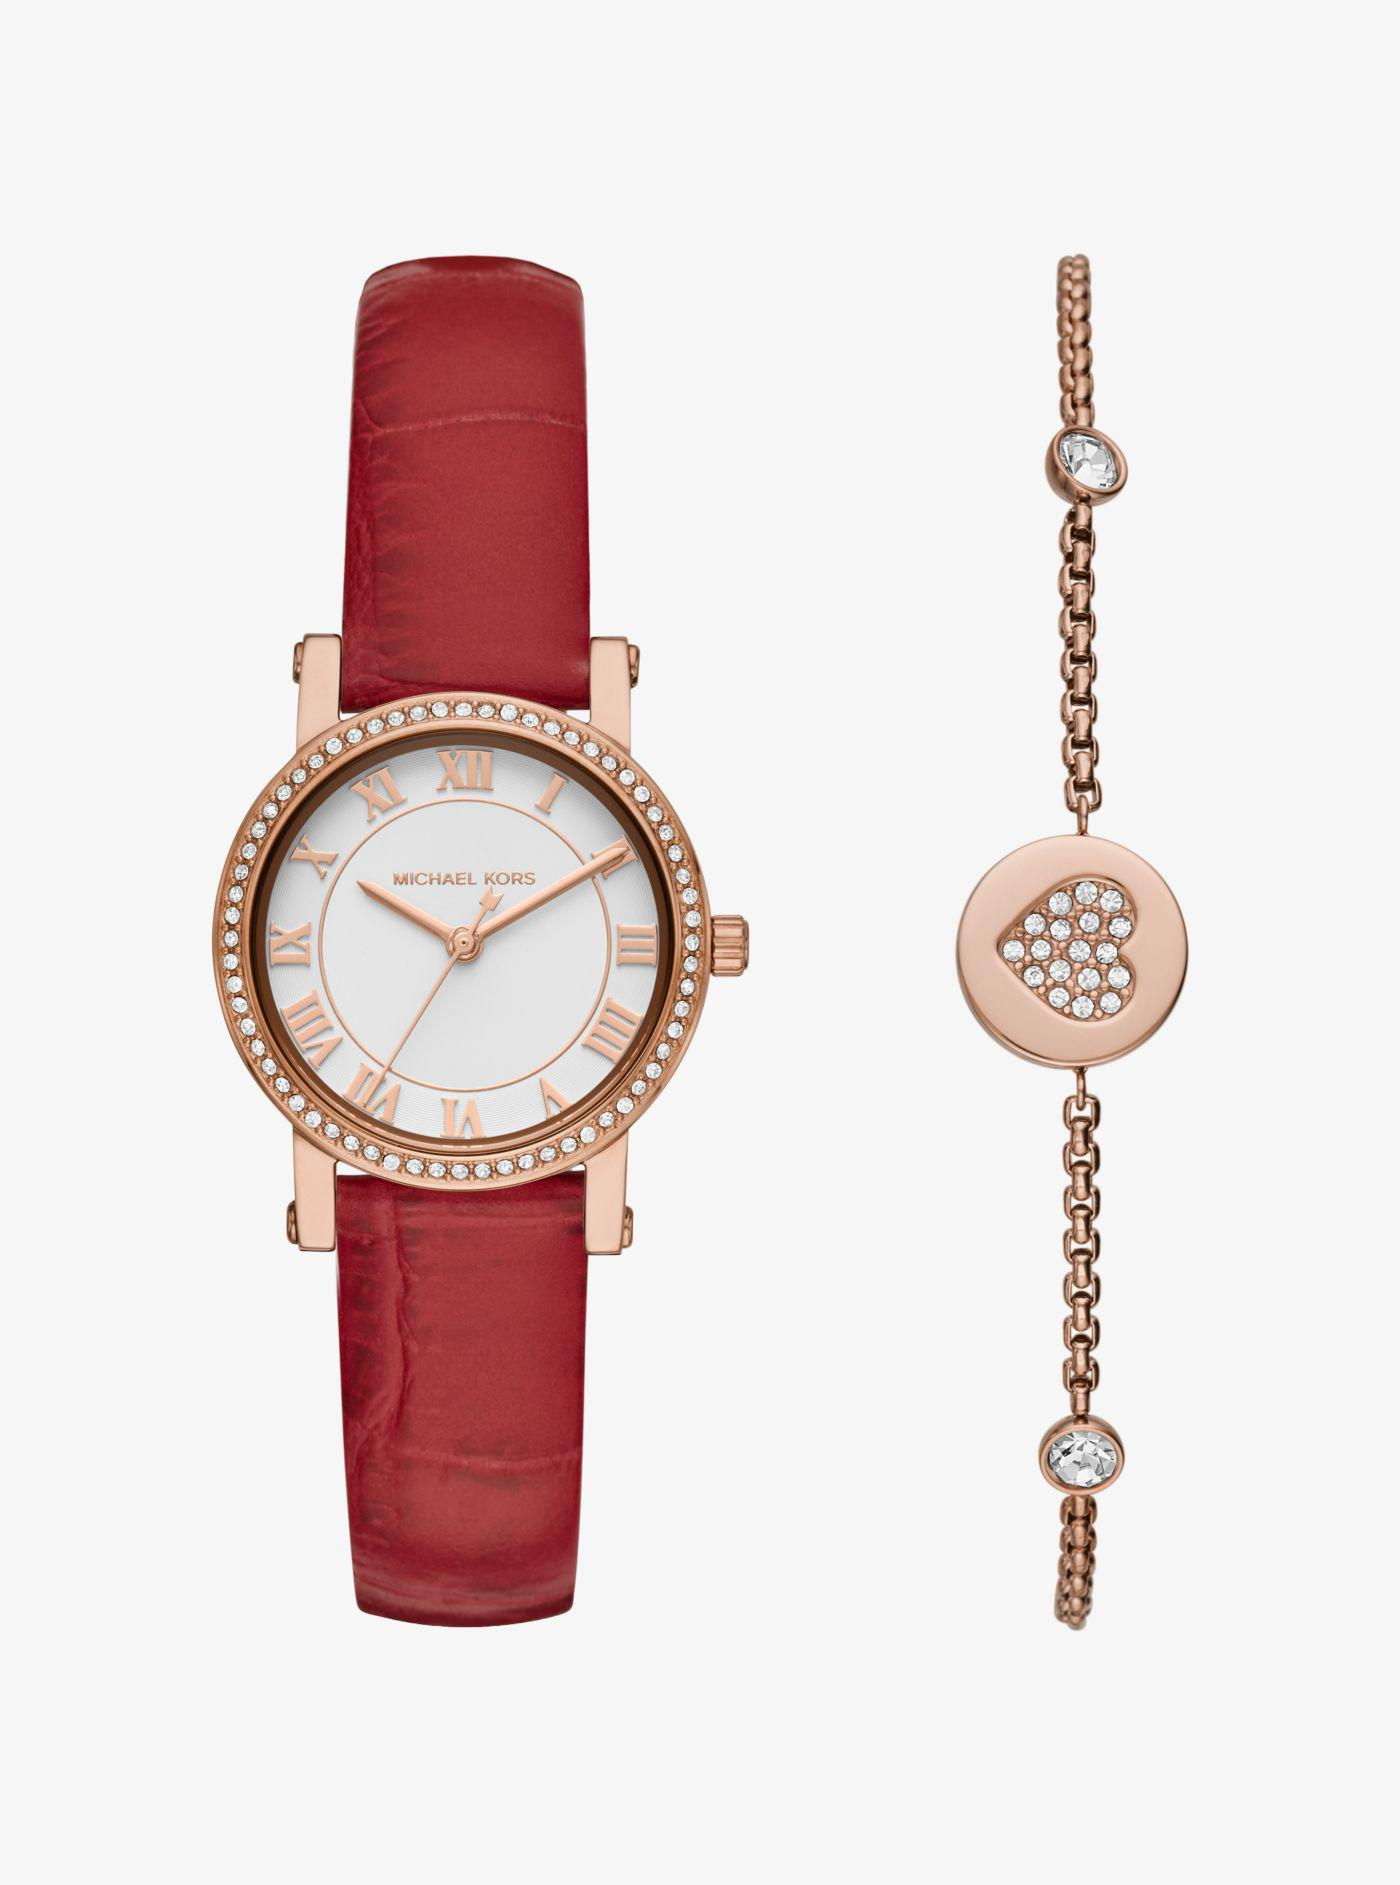 57c878276f8b Lyst - Michael Kors Petite Norie Rose Gold-tone Watch And Bracelet ...